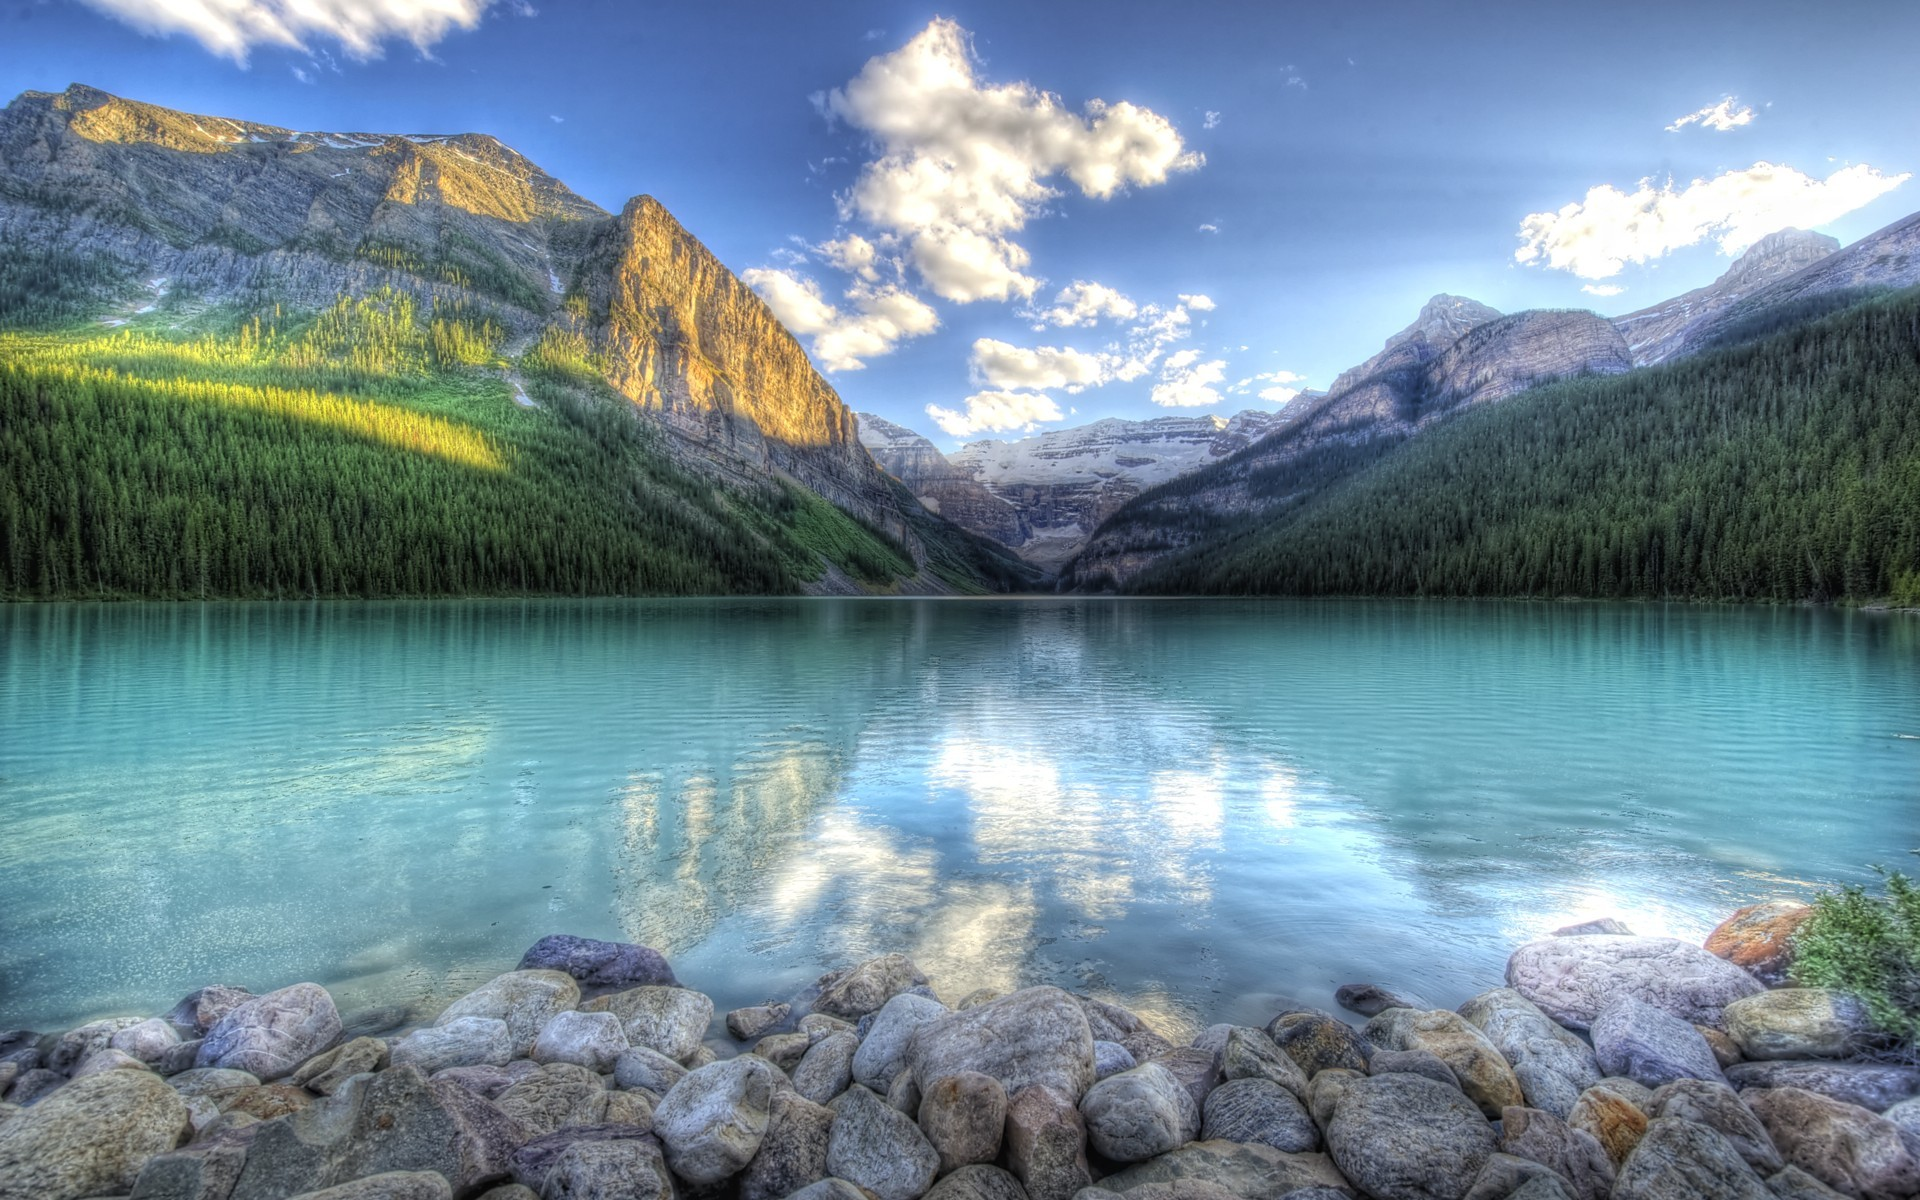 windows 10 nature wallpaper,mountain,natural landscape,mountainous landforms,nature,reflection